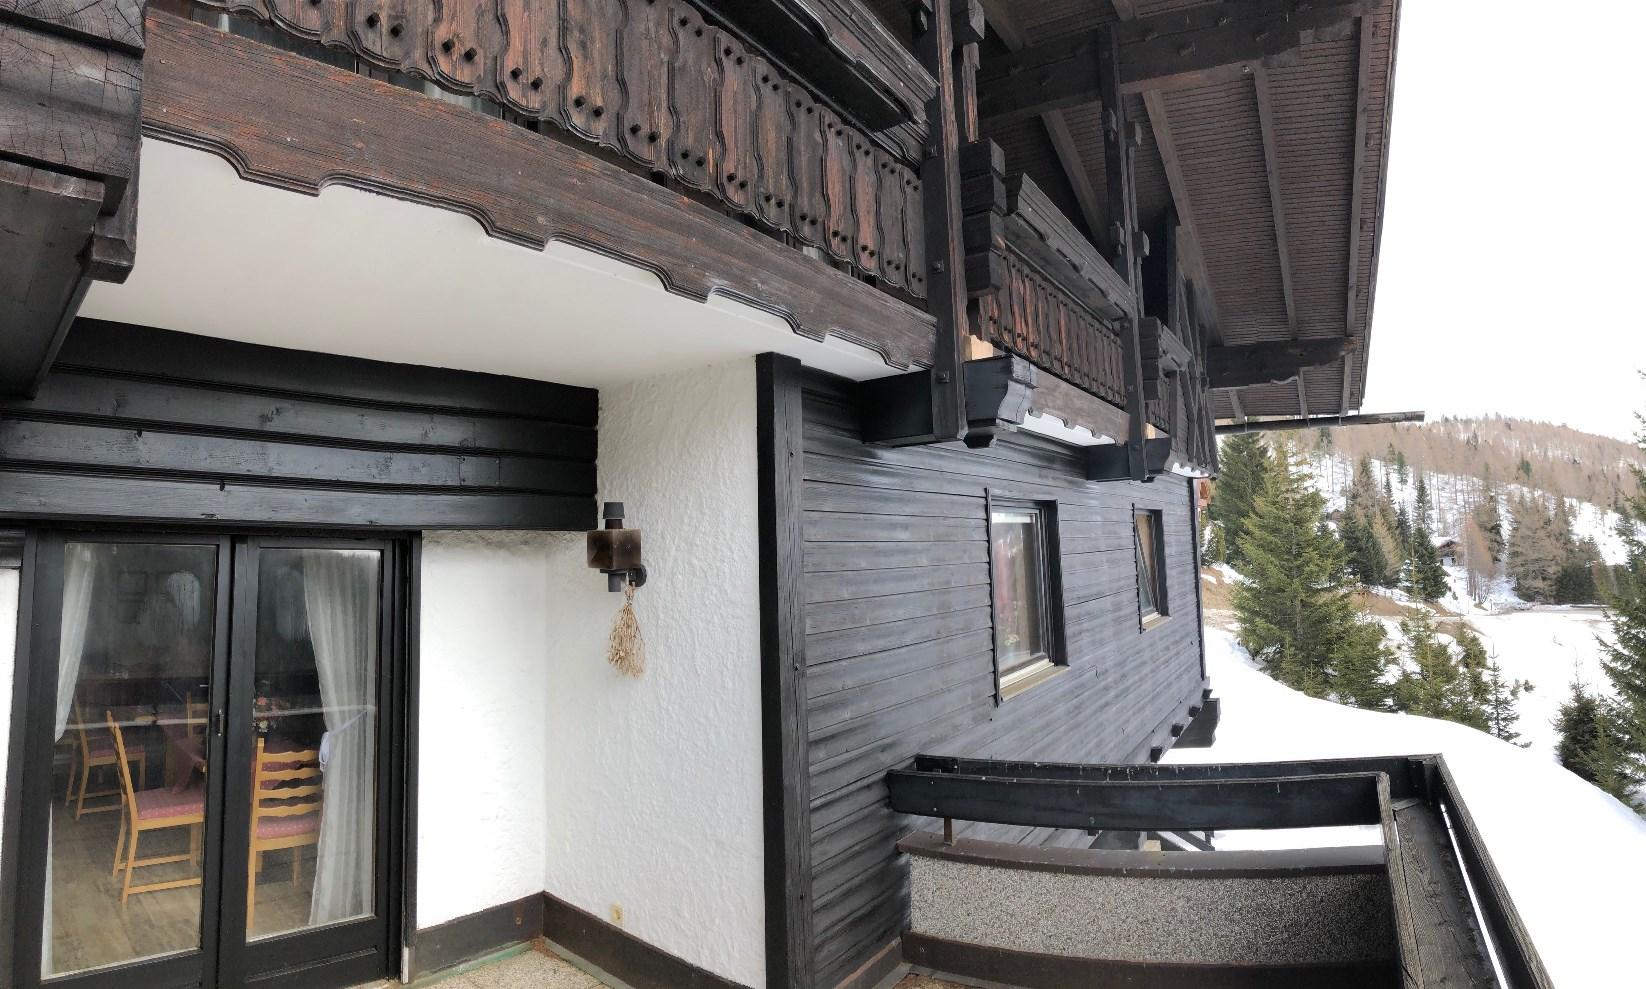 Falkert, Kaernten, Grosszuegige Villa (BLOC) fuer Ihren Familienclan, 5 Schlafzimmer, Indoorpool